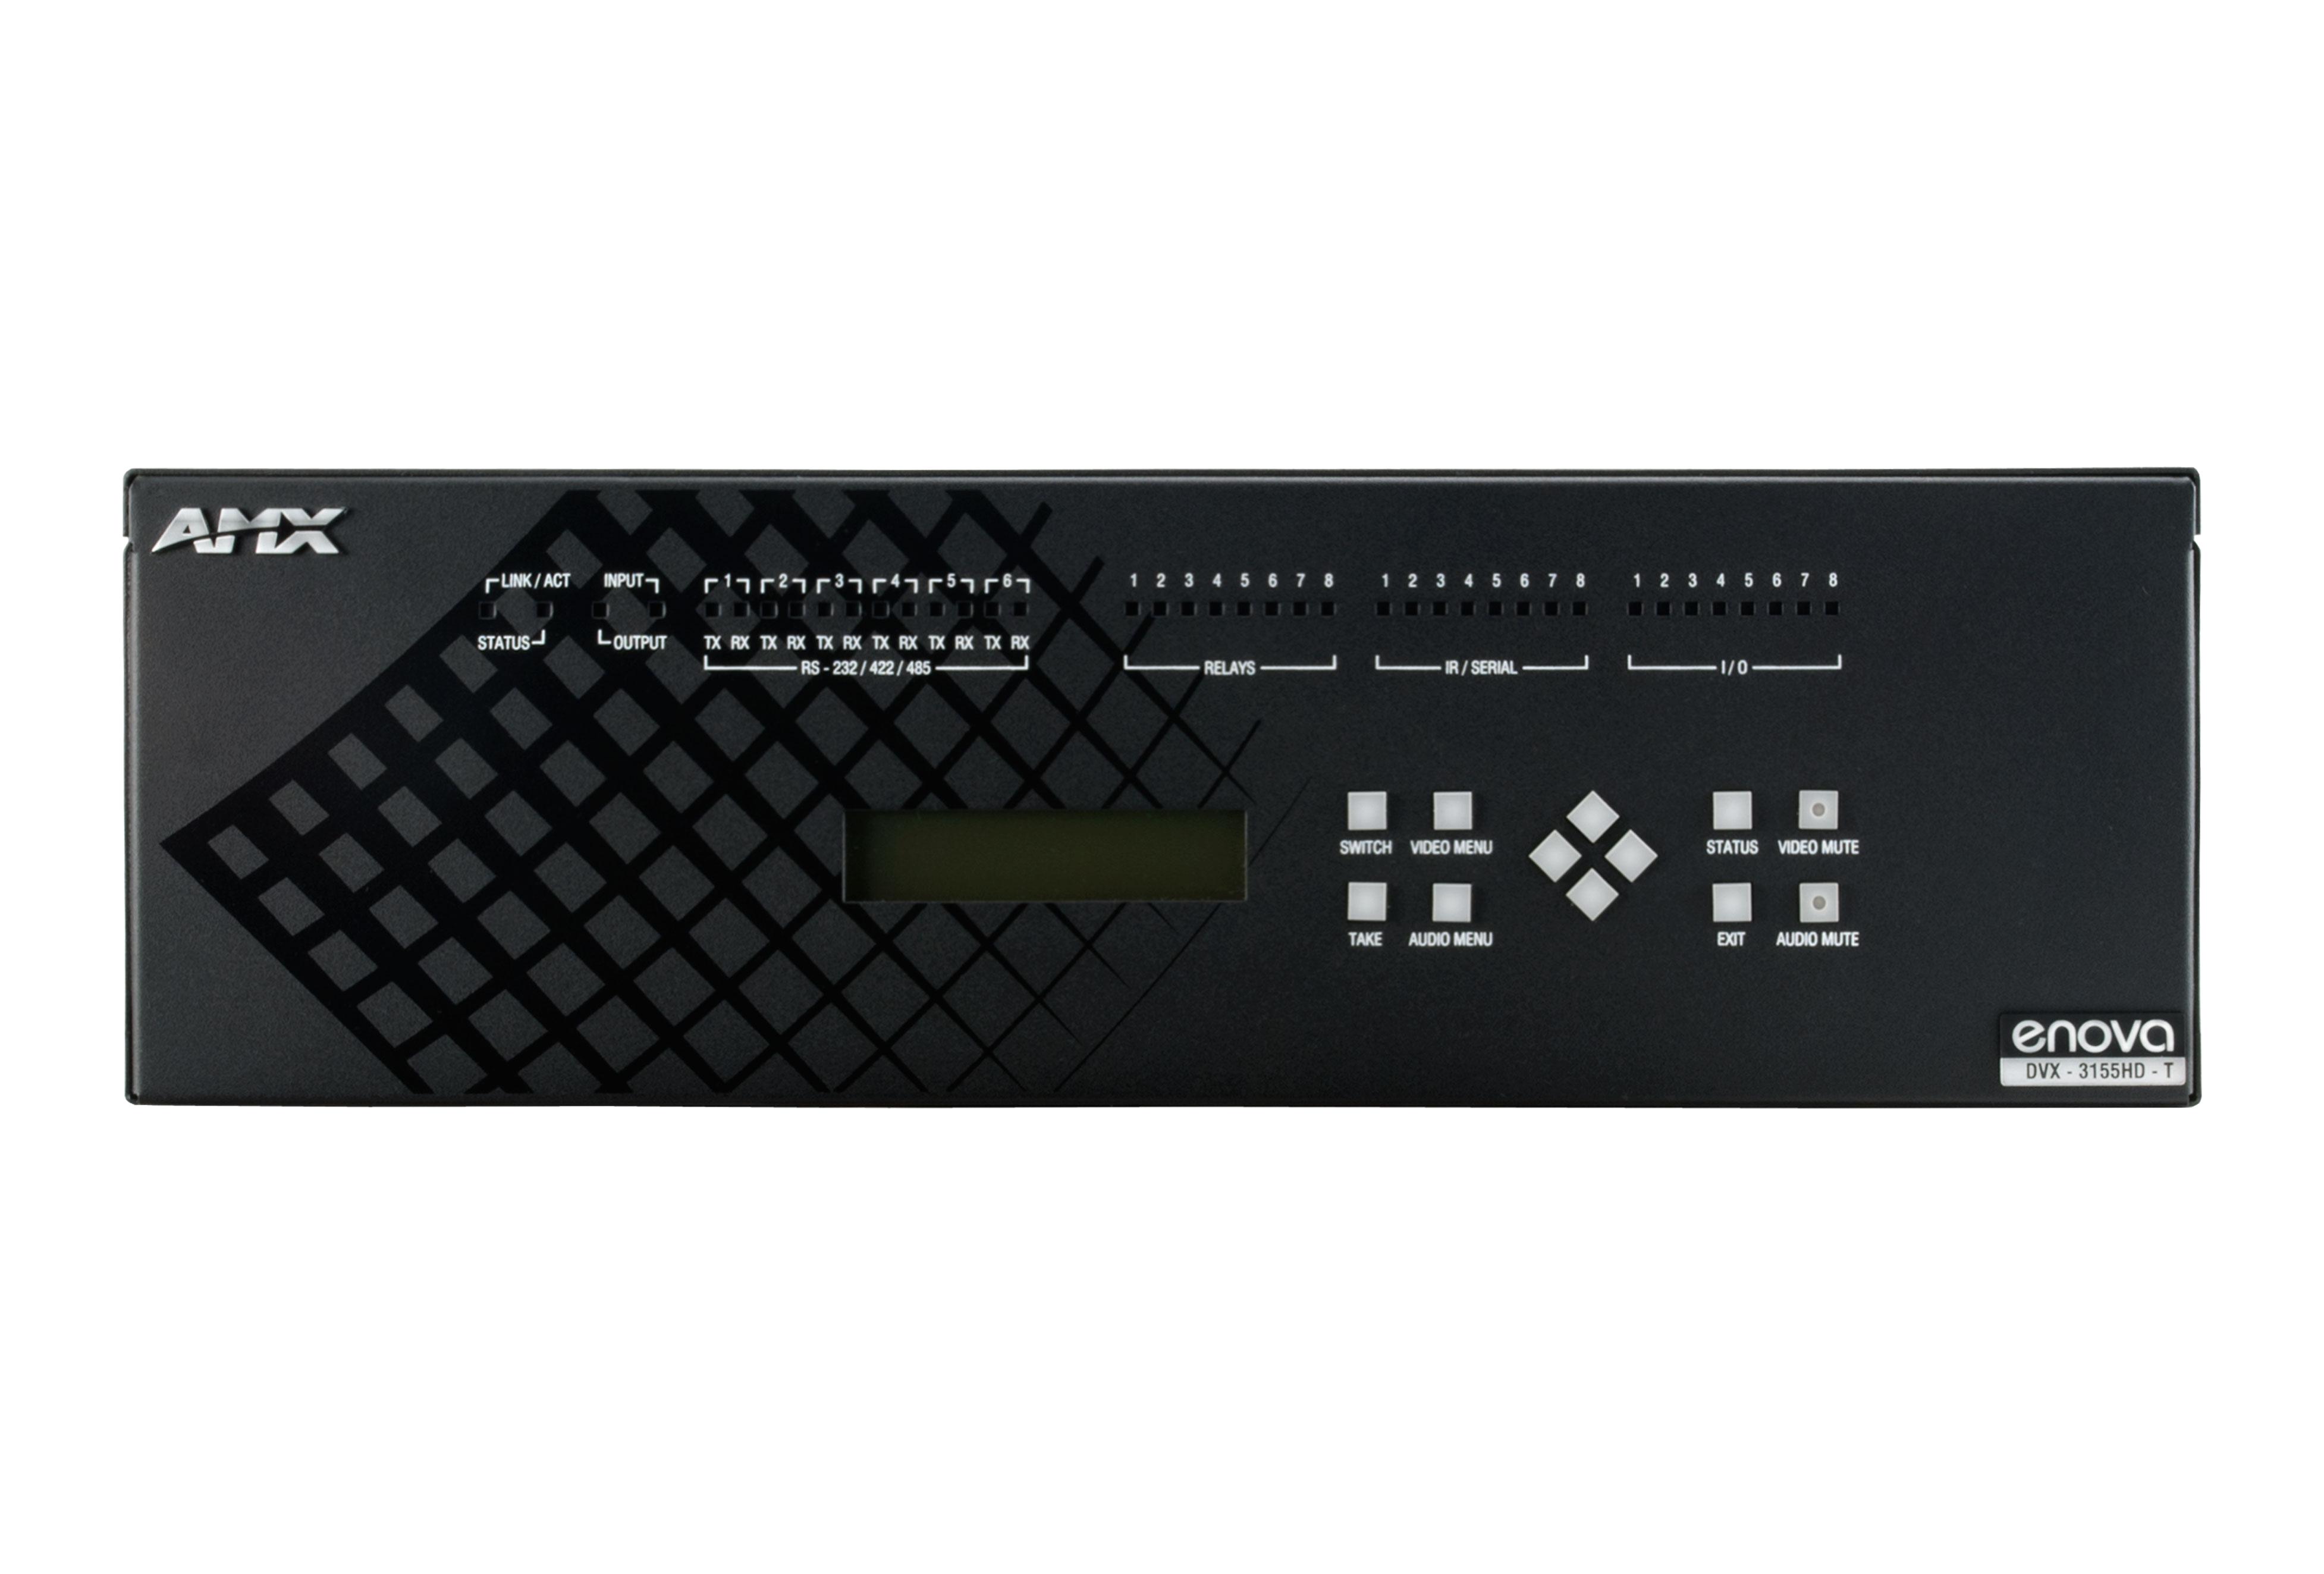 DVX-3155HD-T - Front